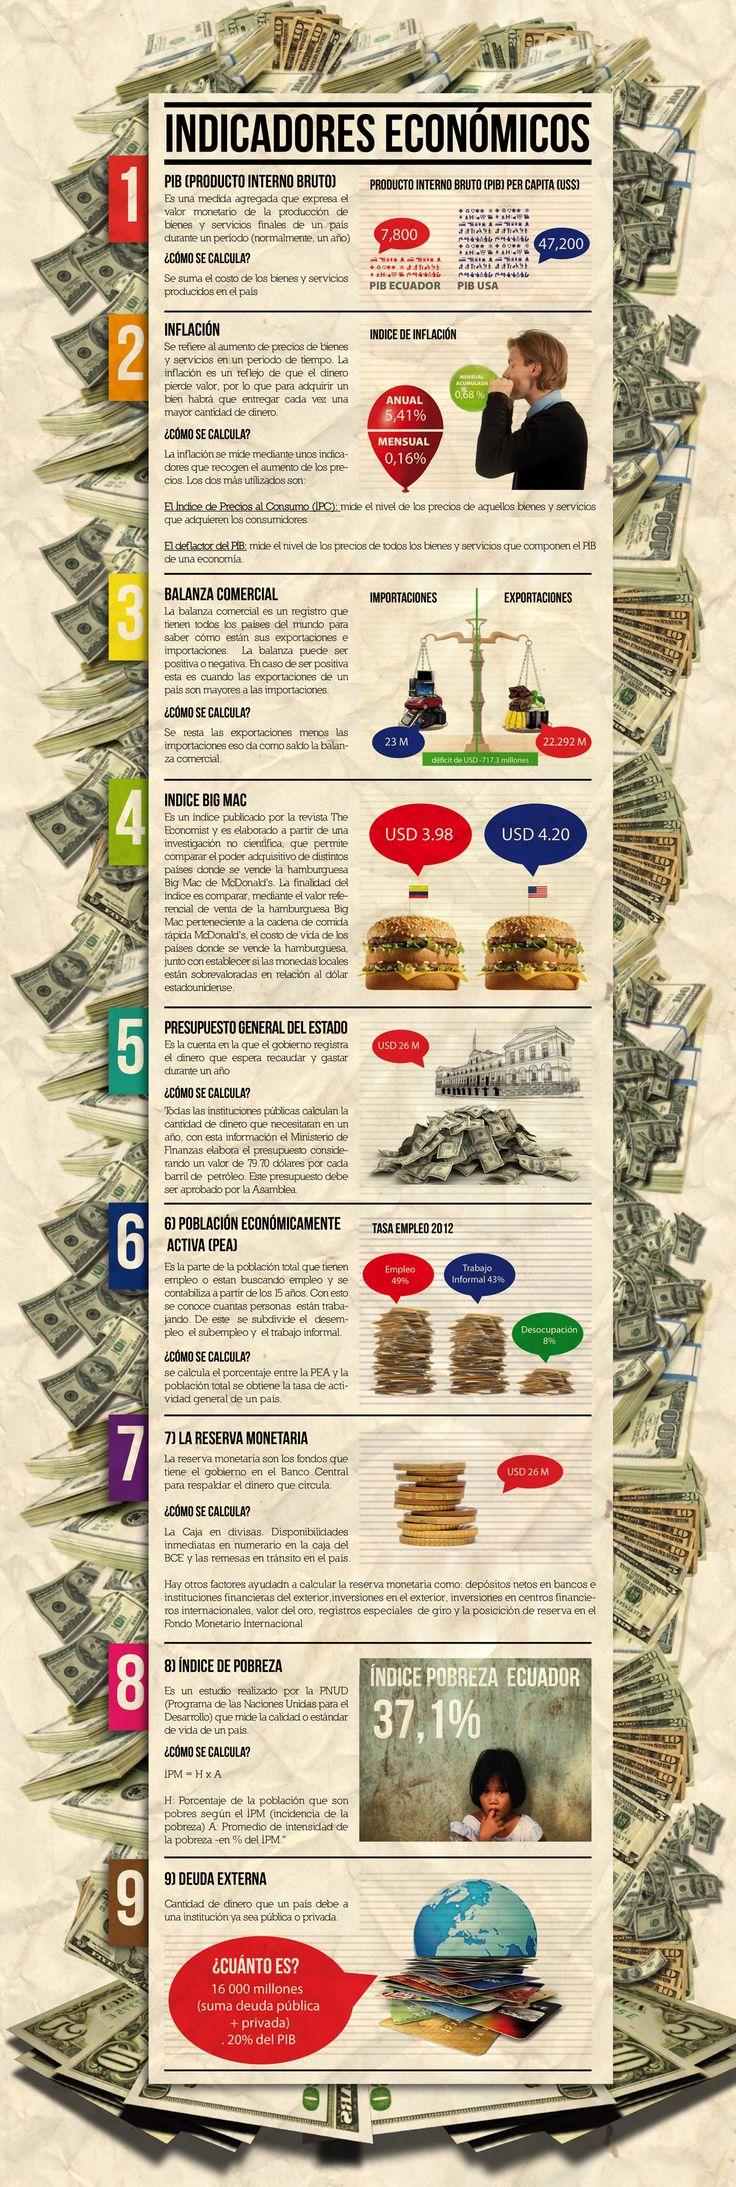 Infografía indicadores económicos